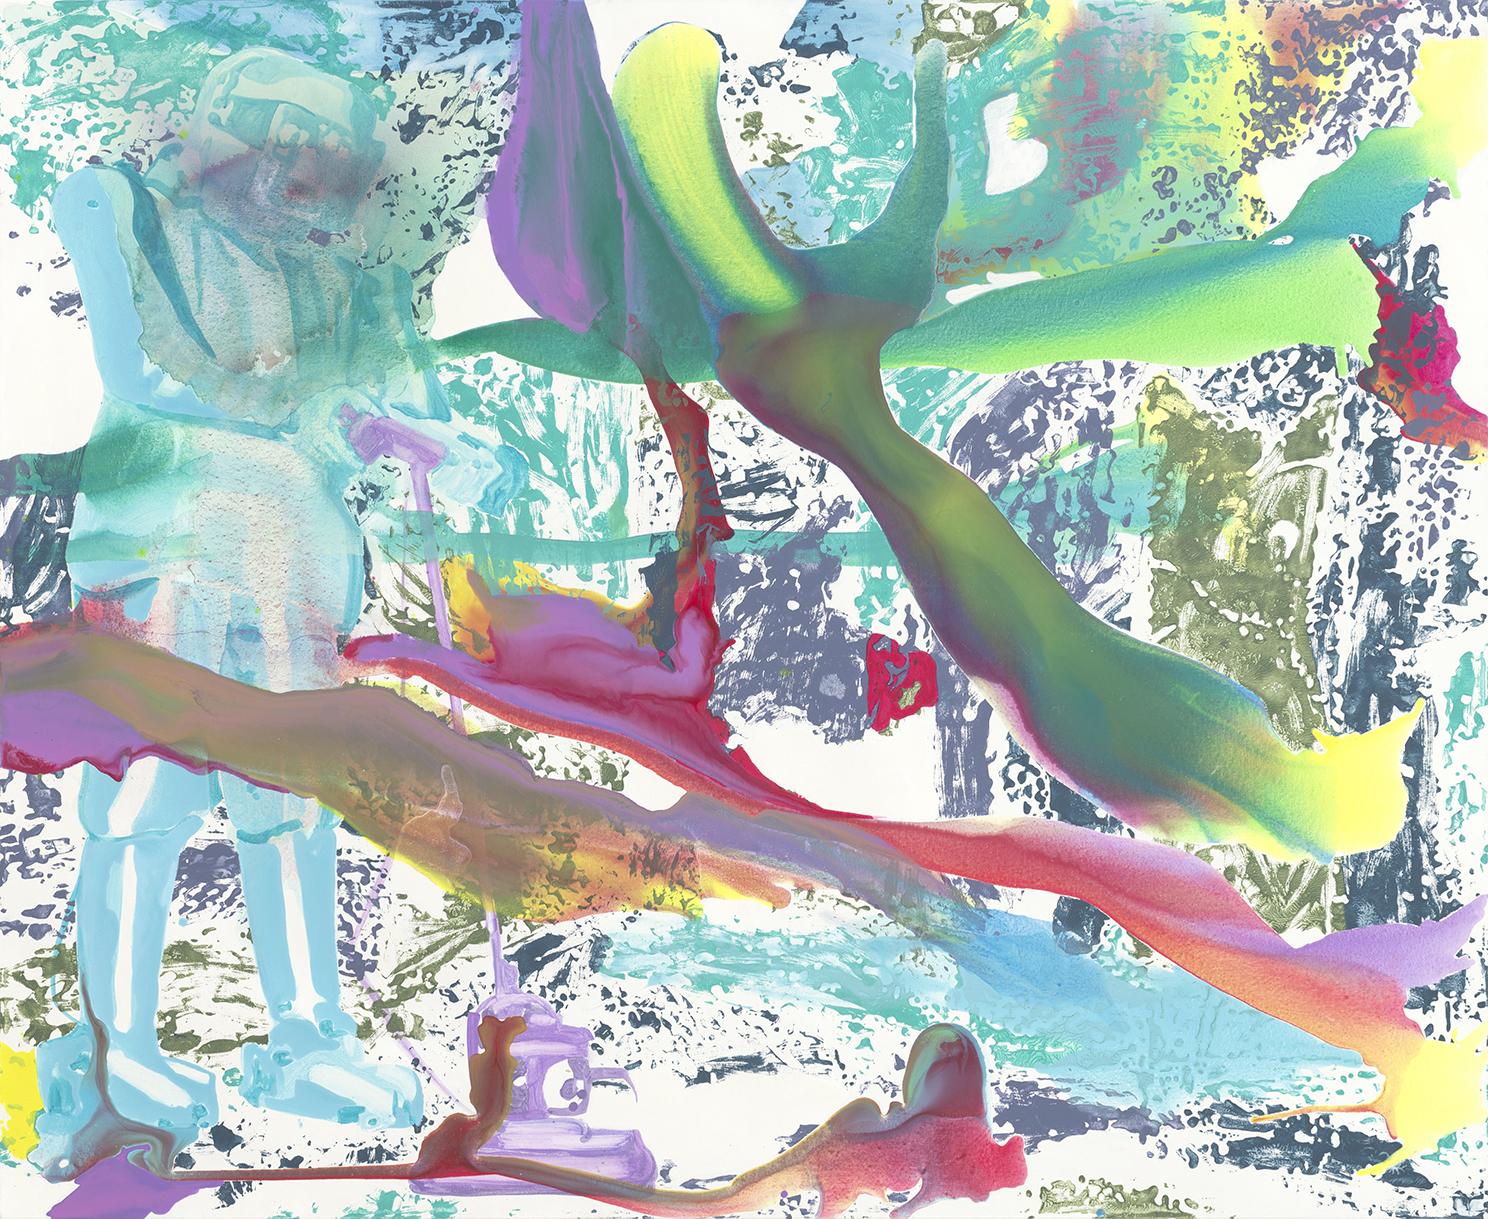 Robotaholica  | Aquarell, Tusche, Acryl und Linoldruck auf Leinwand | 180 x 220 cm